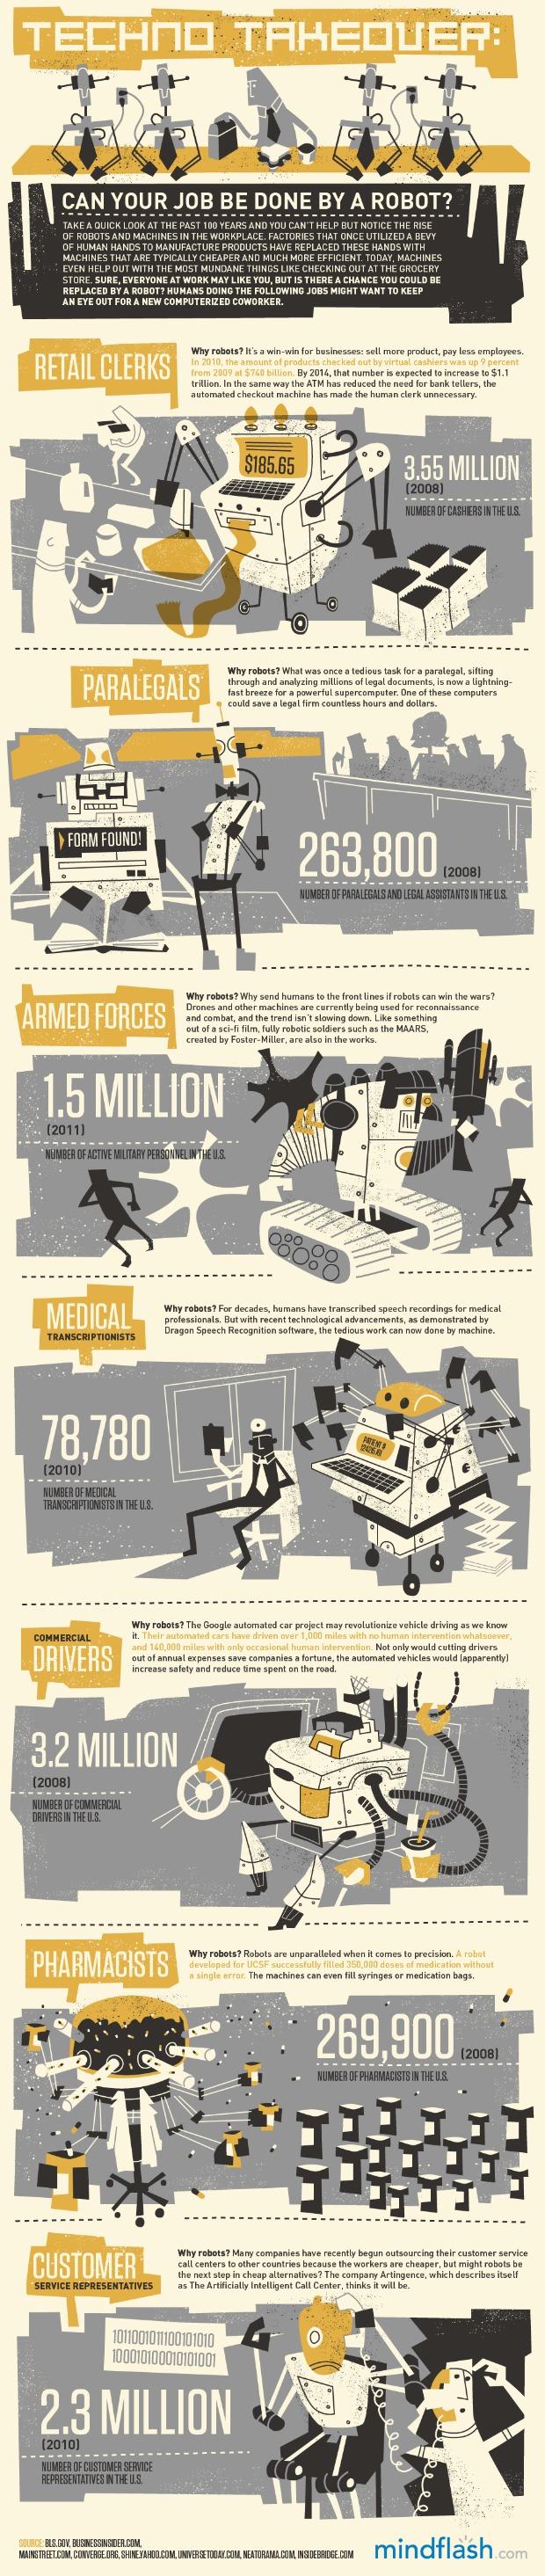 Mindflash Infographic